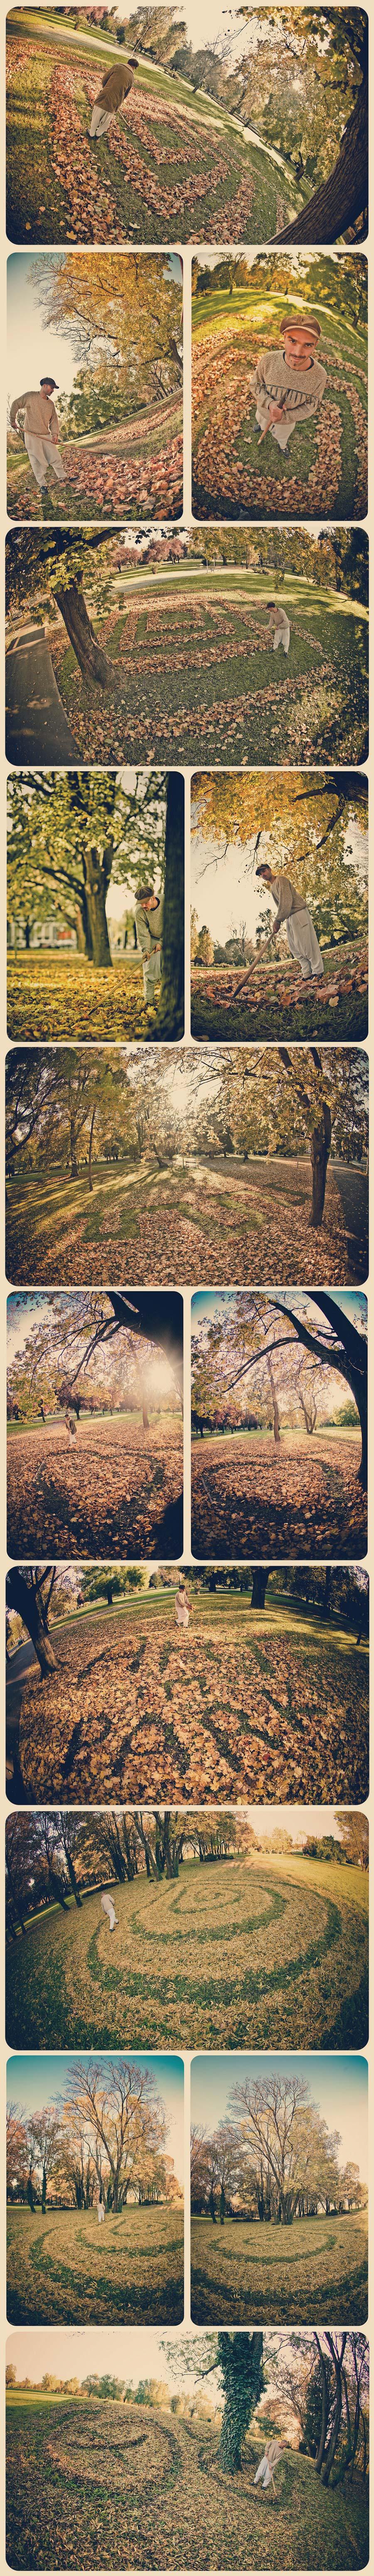 ART im PARK by Nikola Faller  Kako iskoristiti prekrasan dan?  foto: Tomislav Šilovinac Šiki    Ključne riječi: osijek park faller jesen